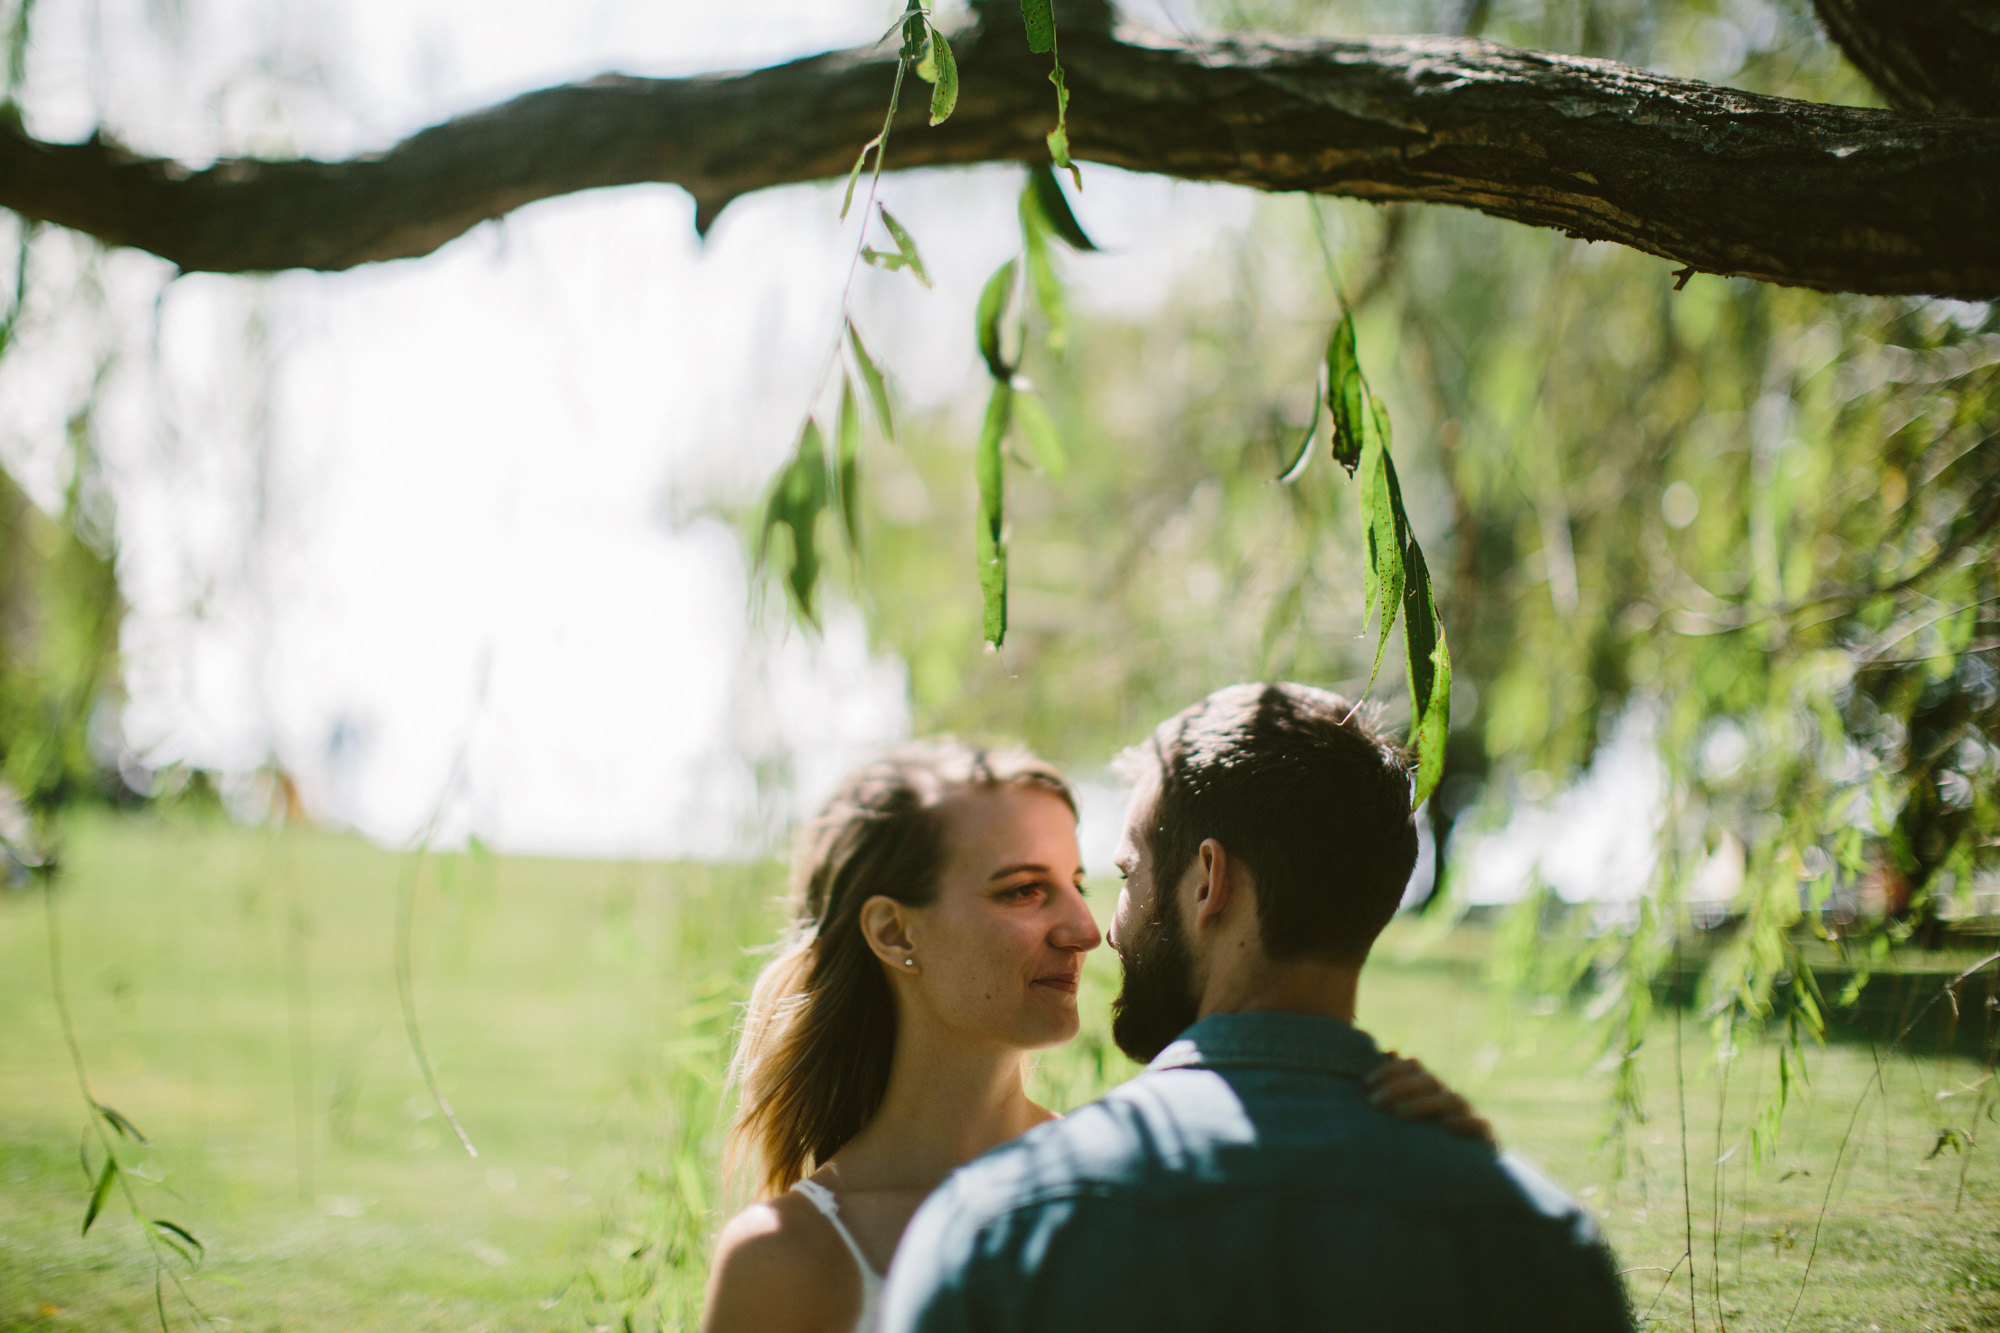 alec_vanderboom_springfield_missouri_wedding-0020.jpg